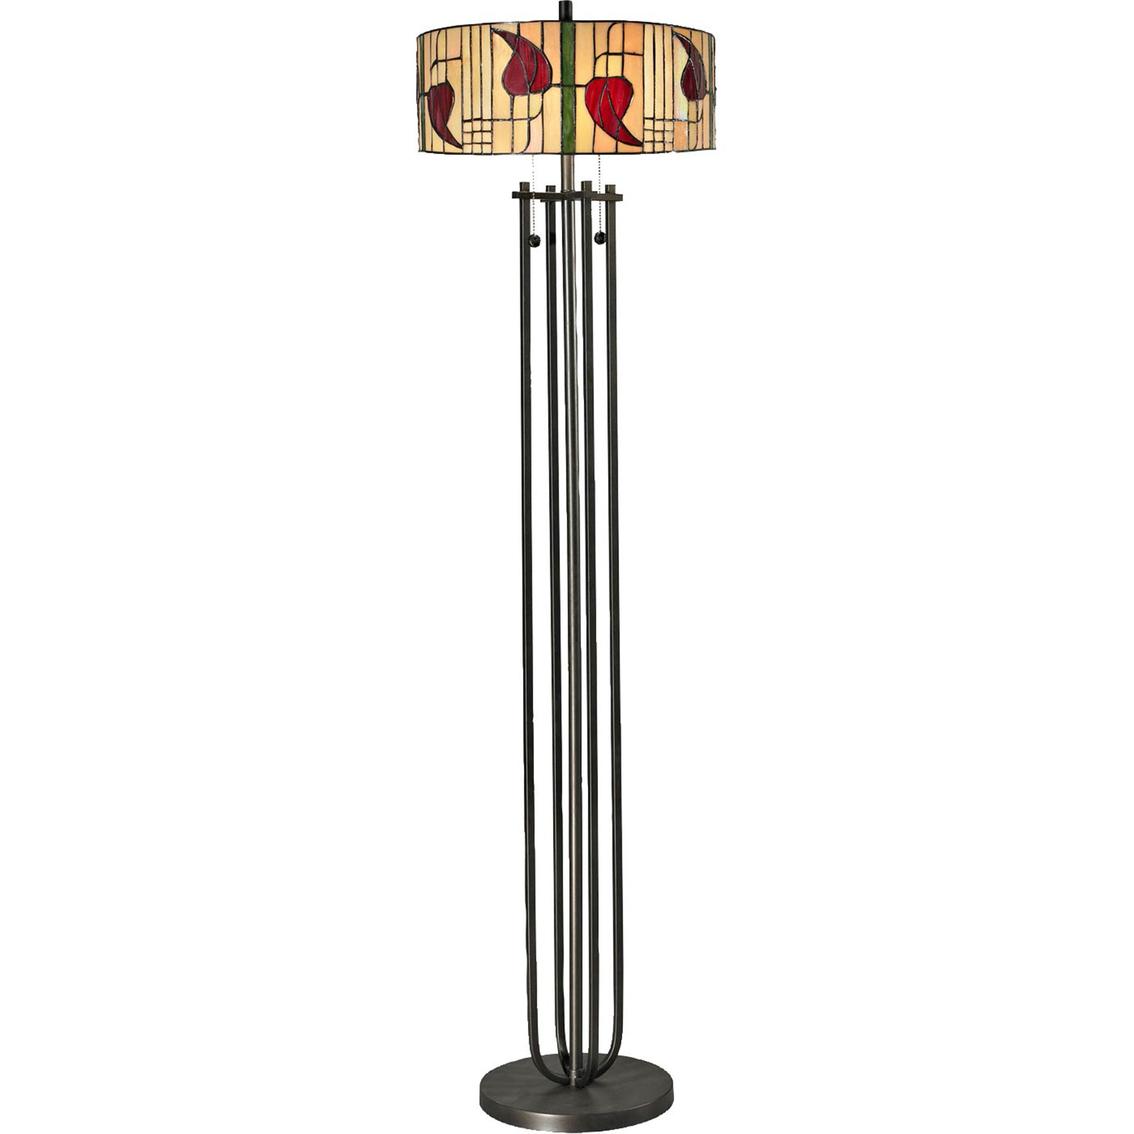 dale tiffany 61 in macintosh tiffany style 2 light floor lamp floor. Black Bedroom Furniture Sets. Home Design Ideas